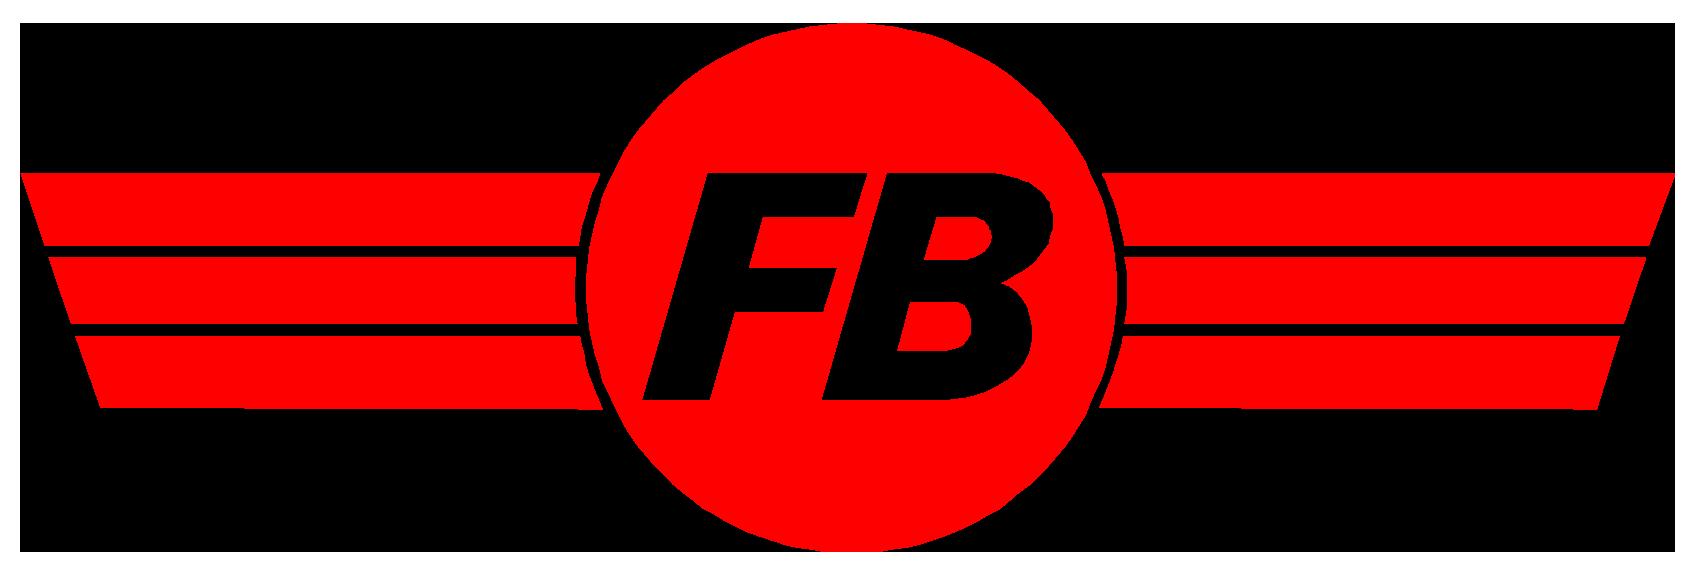 Logo Forchbahn